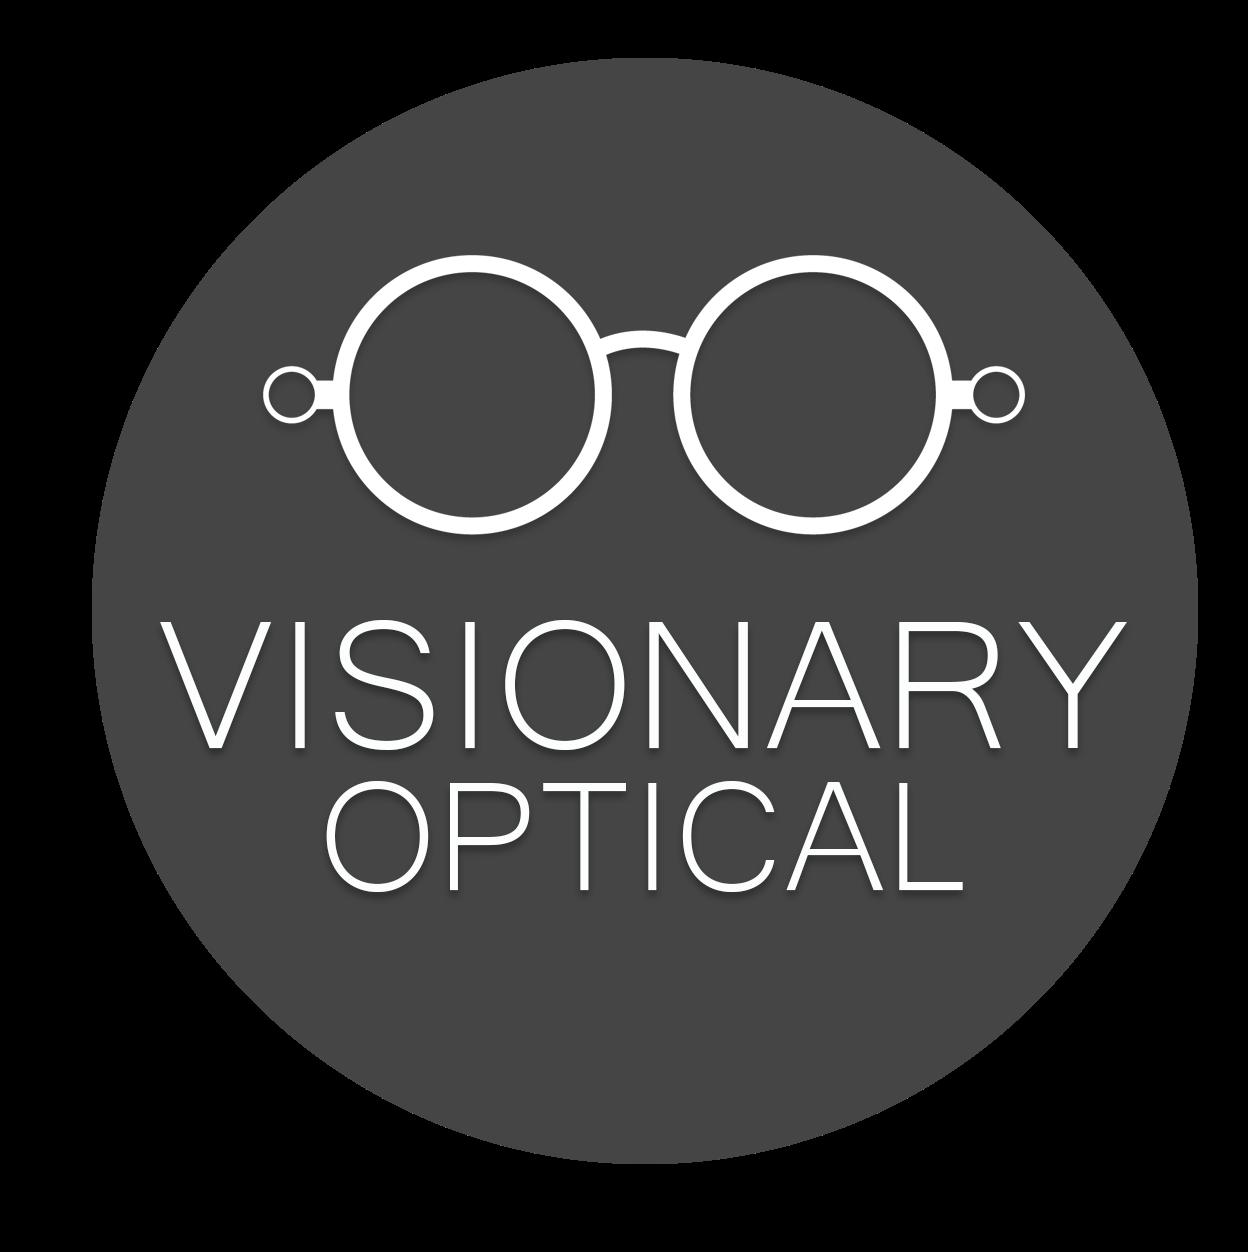 Visionary Optical